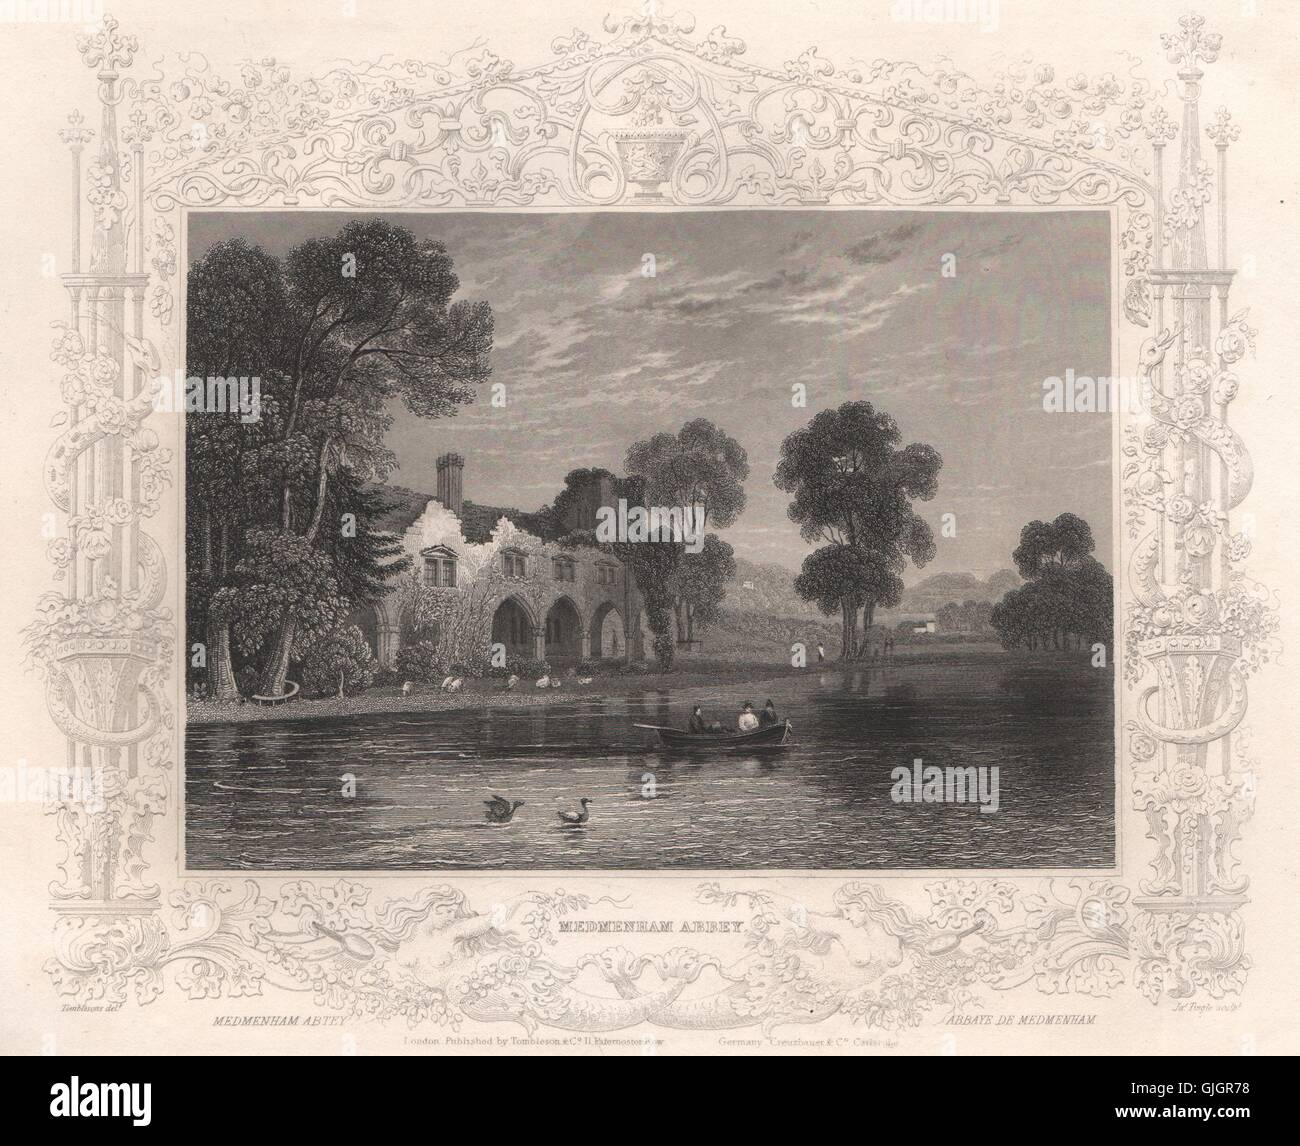 'Medmenham Abbey'. Buckinghamshire. Decorative view by William TOMBLESON, 1835 Stock Photo